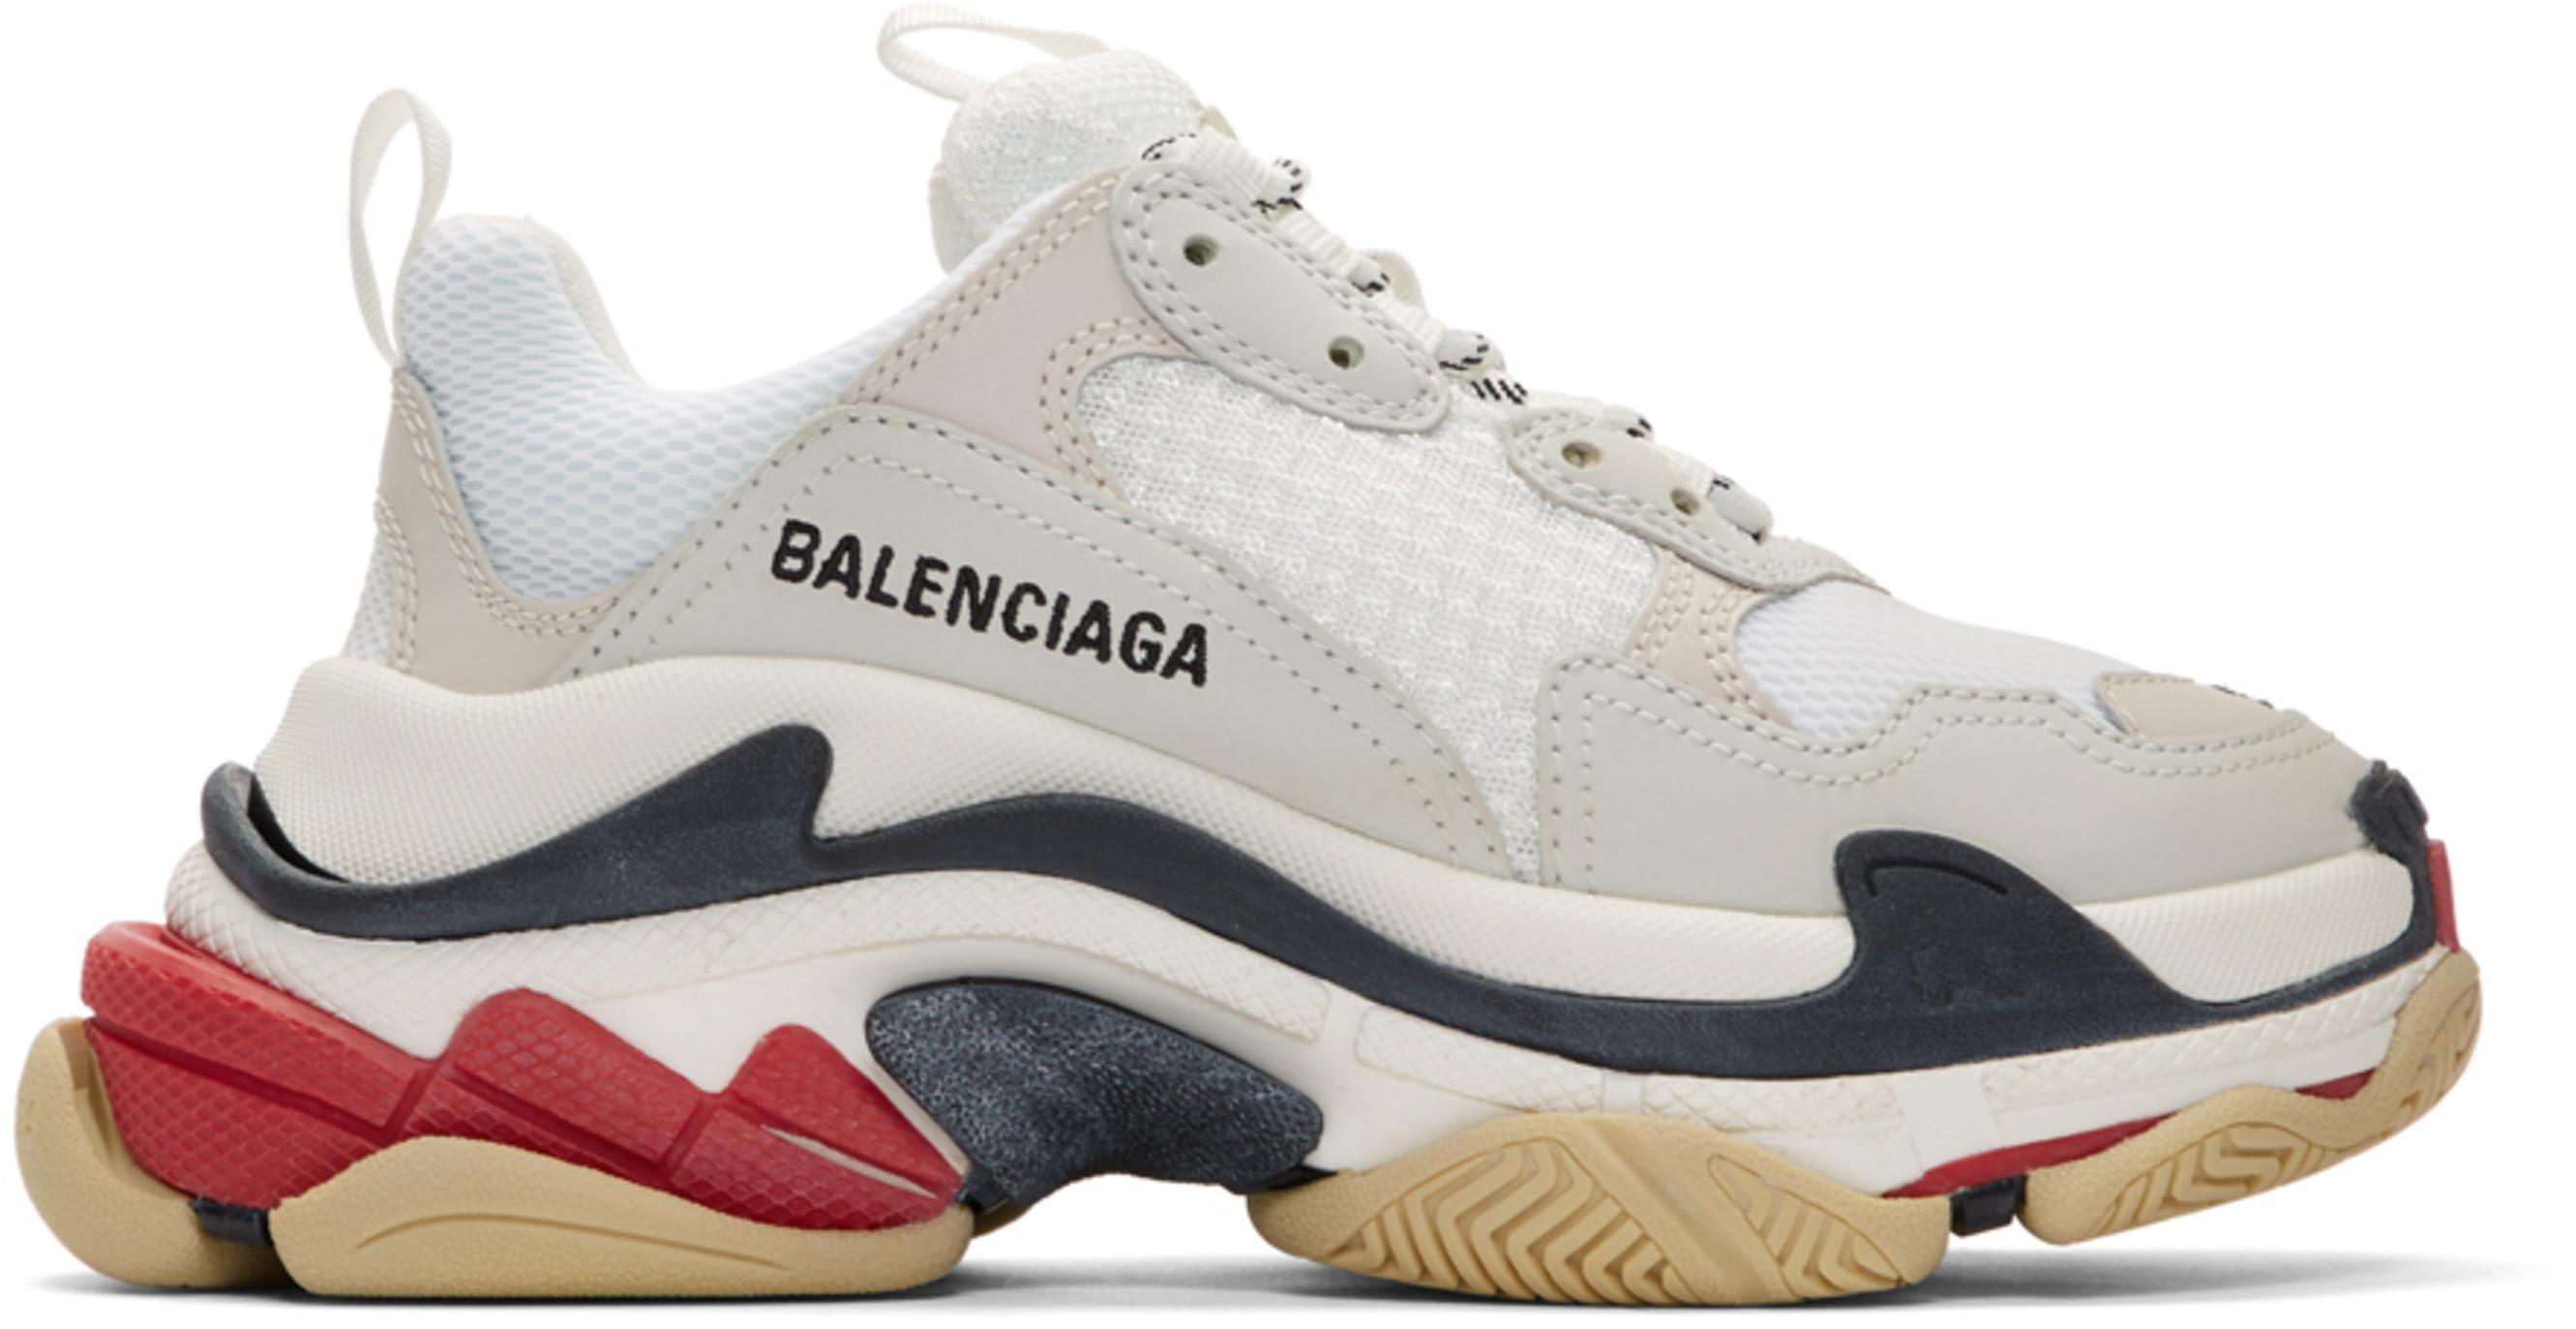 Höchste Qualität Manadlian Originals Sneaker Herren Schuhe